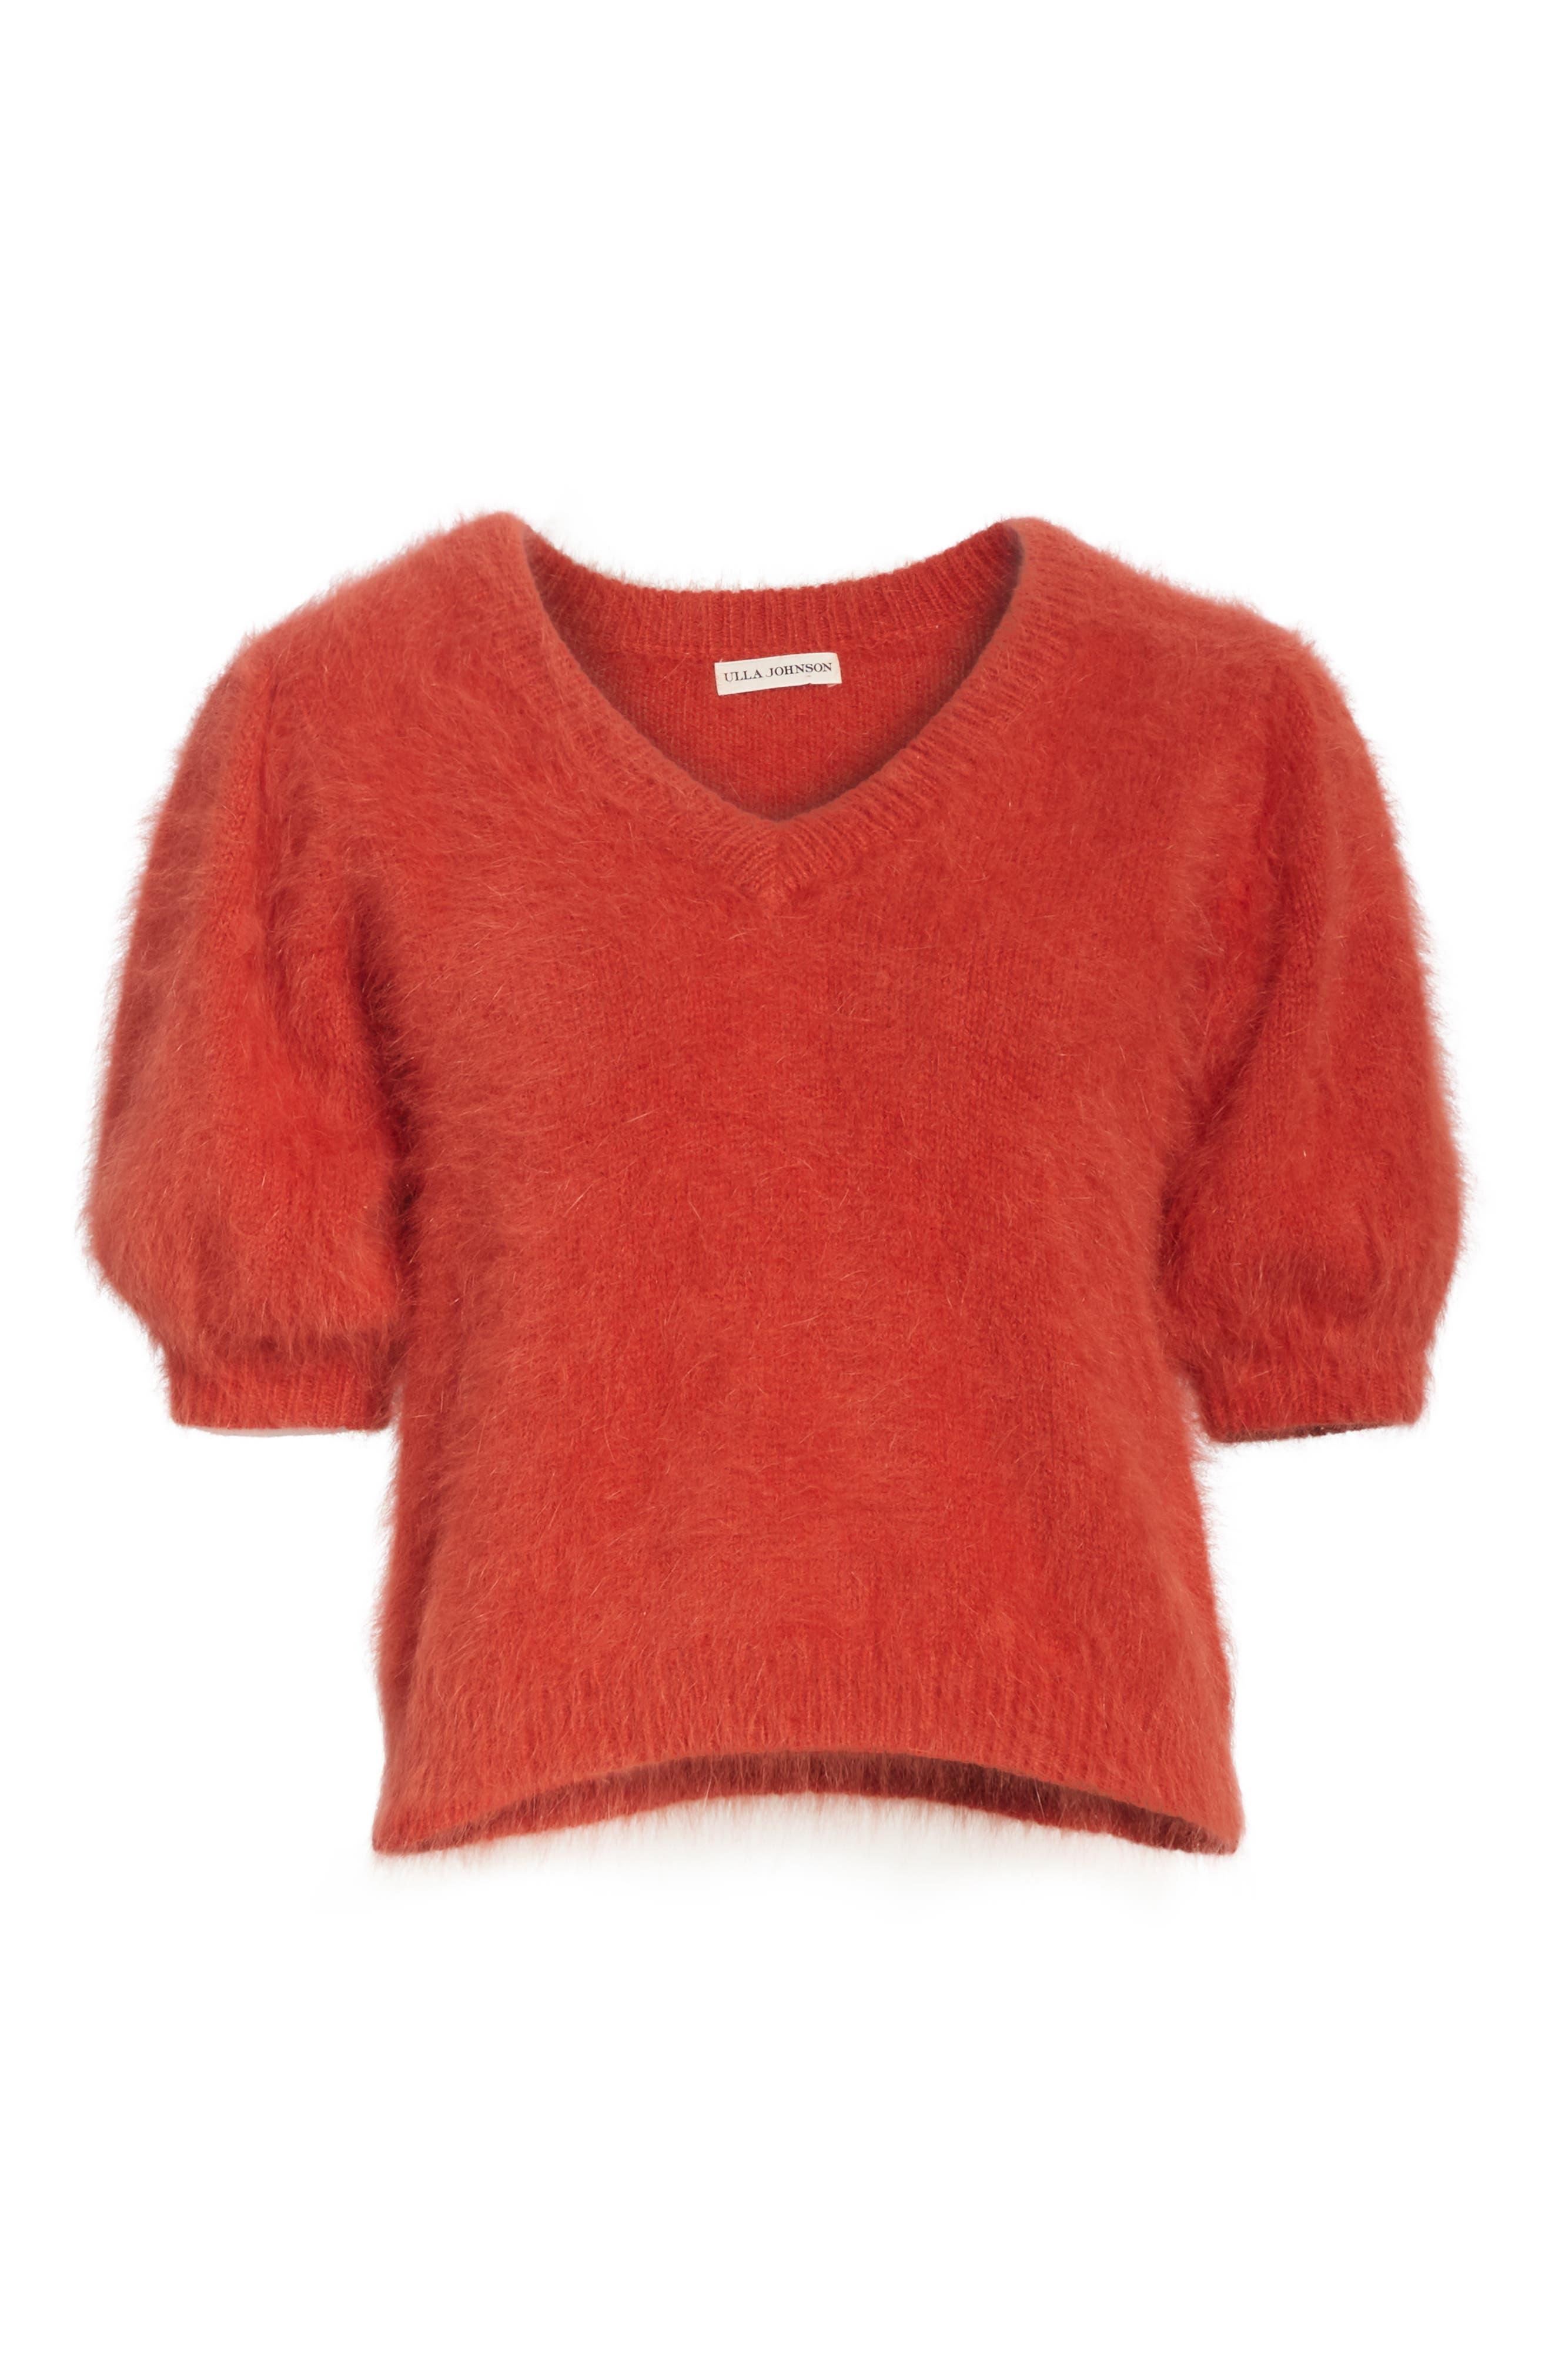 ULLA JOHNSON,                             Aries Puff Sleeve Sweater,                             Alternate thumbnail 6, color,                             600